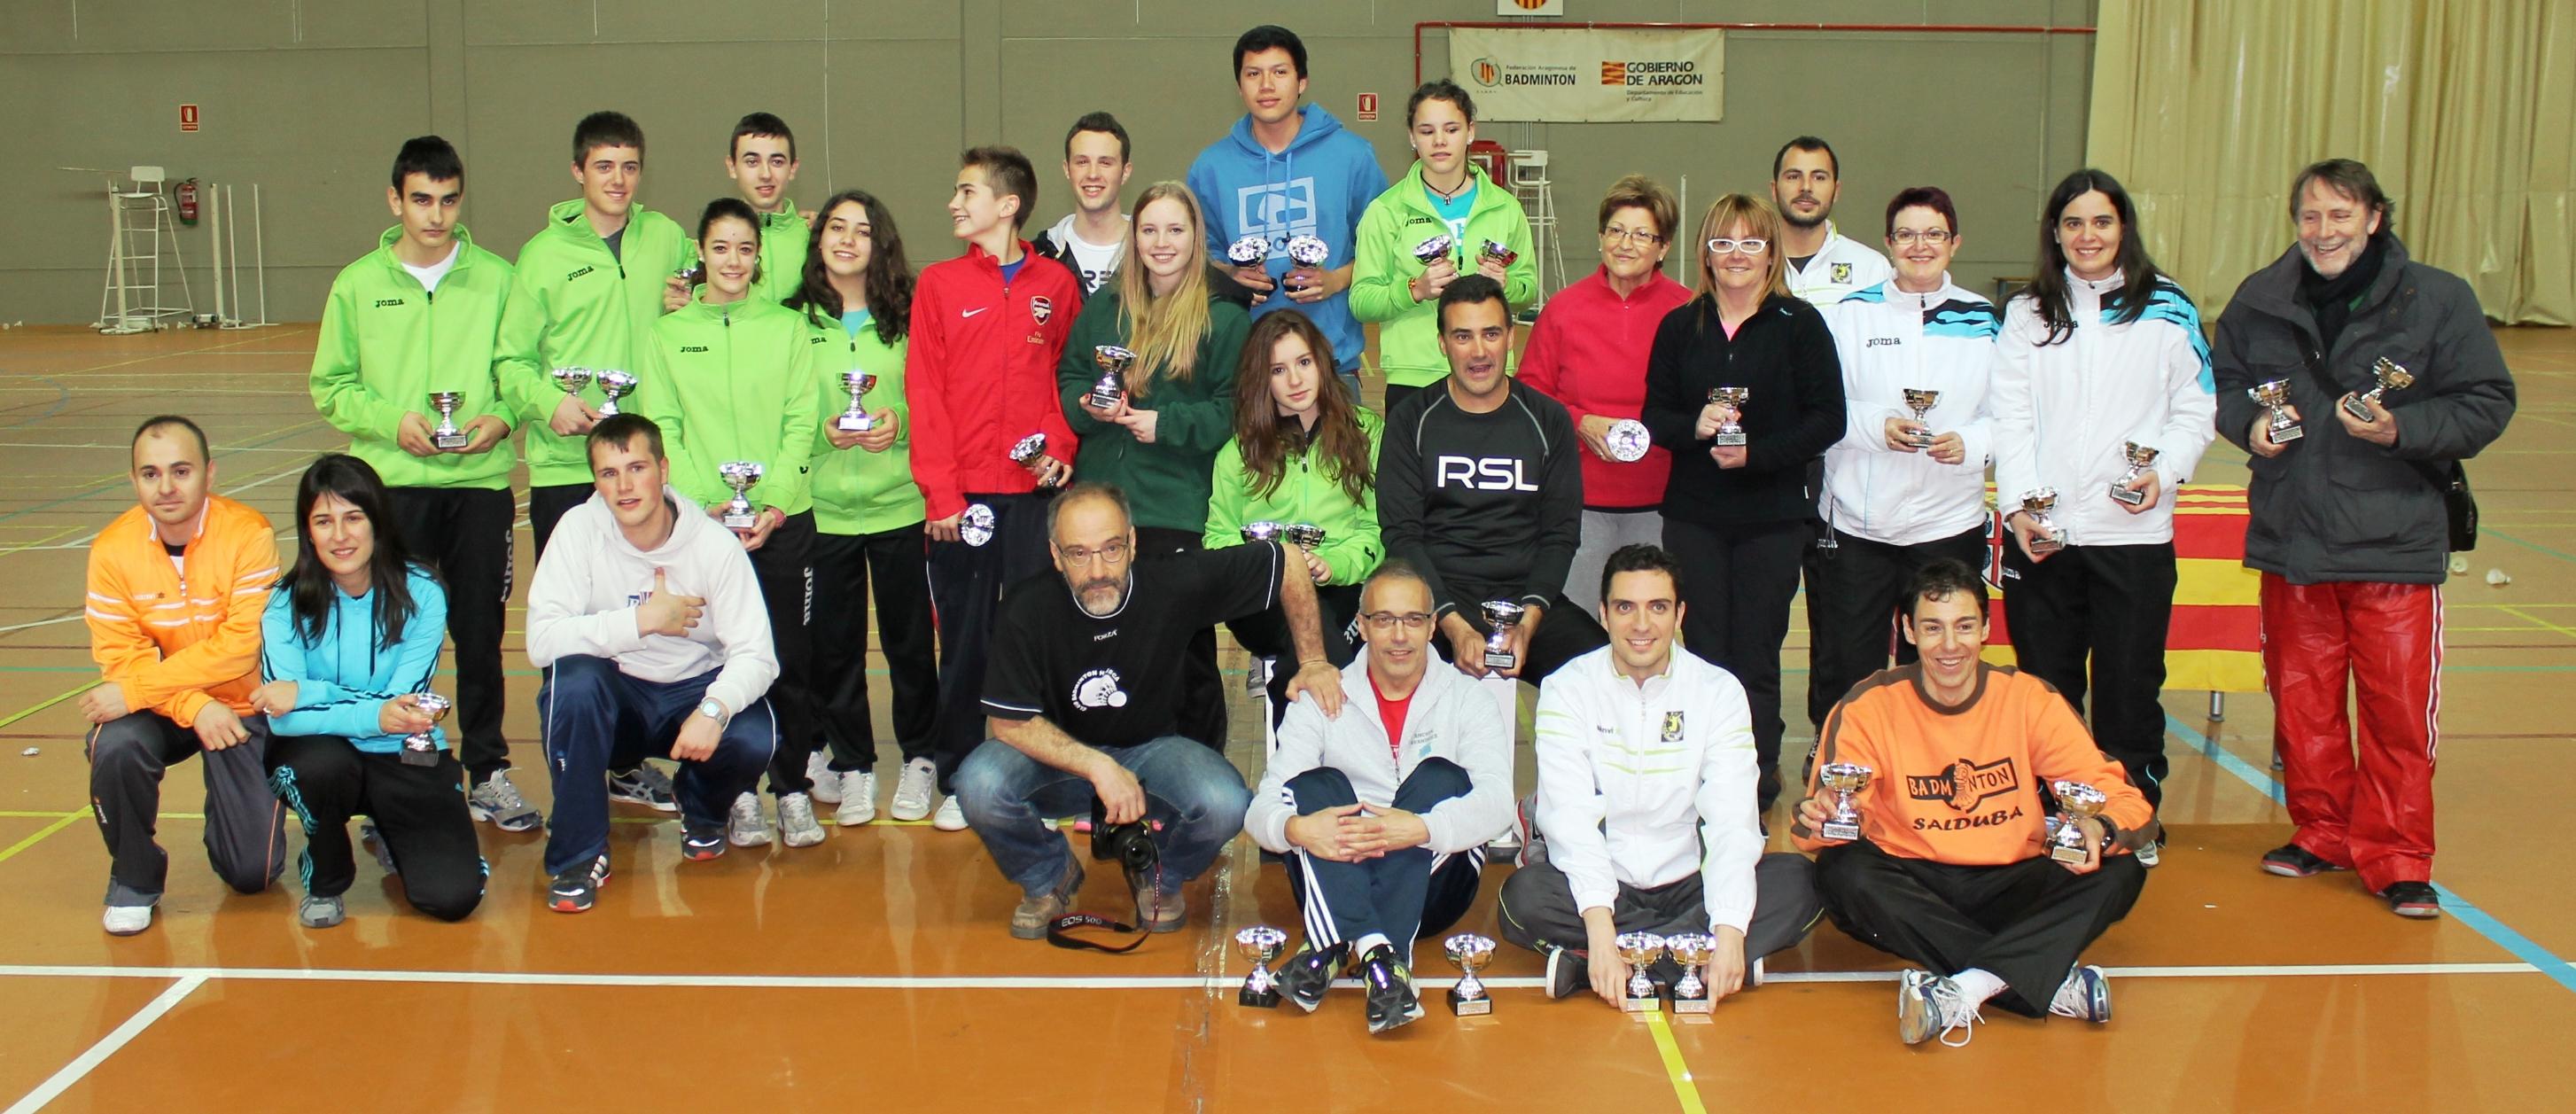 campeones2013.JPG